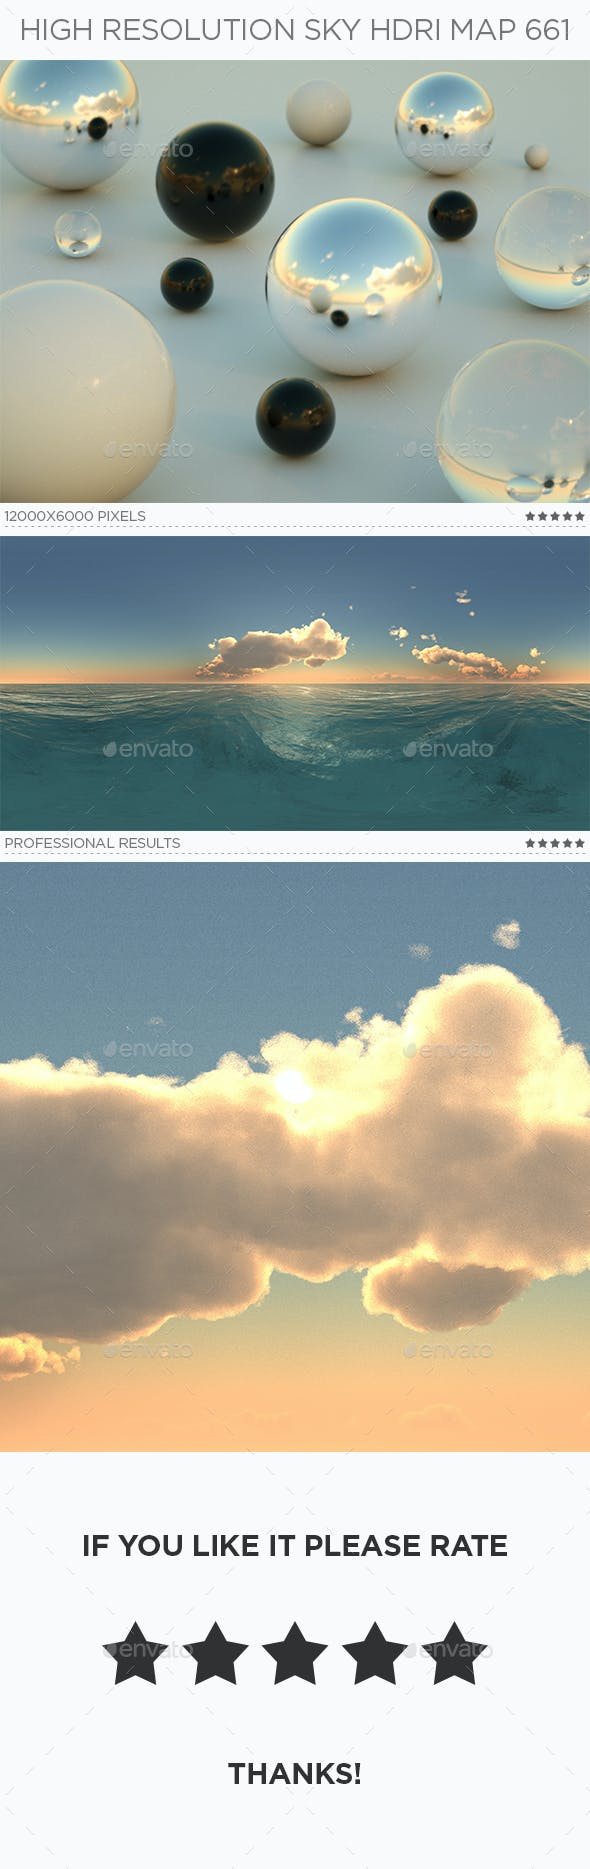 High Resolution Sky HDRi Map 661 - 3DOcean Item for Sale